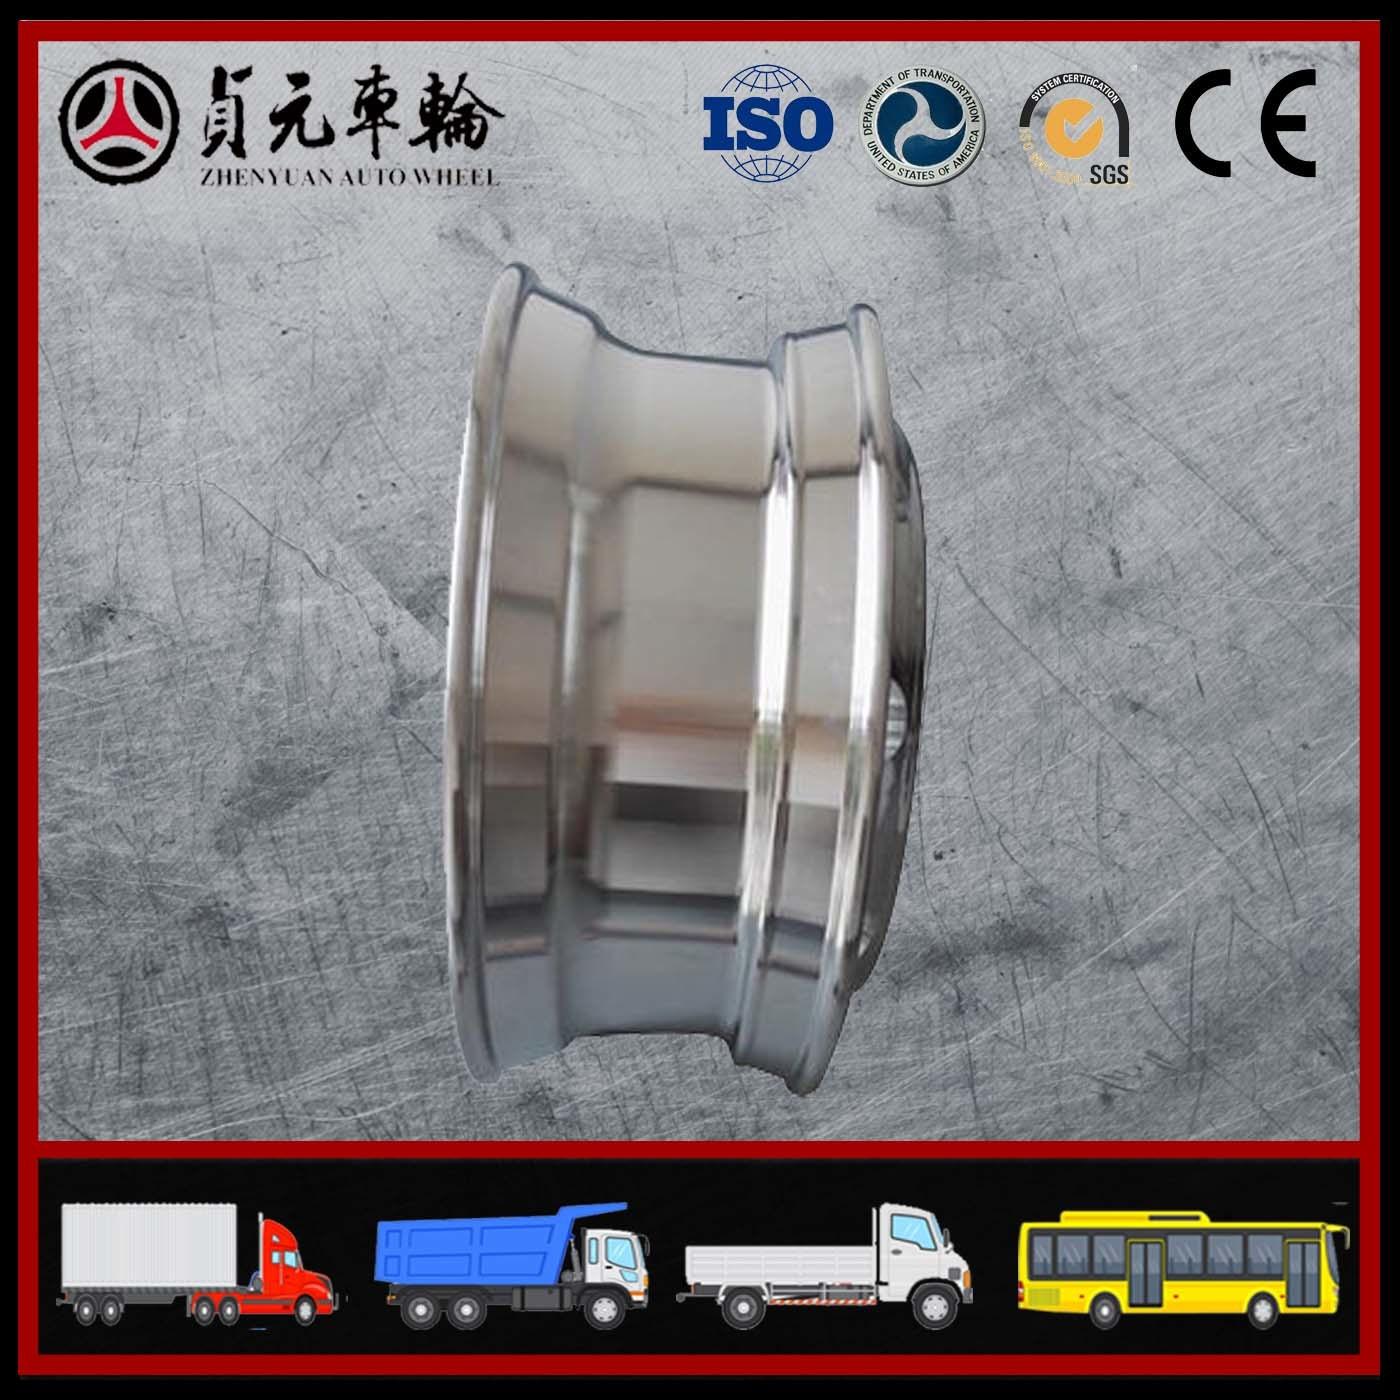 Zhenyuan Auto Wheel for Alloy Wheel